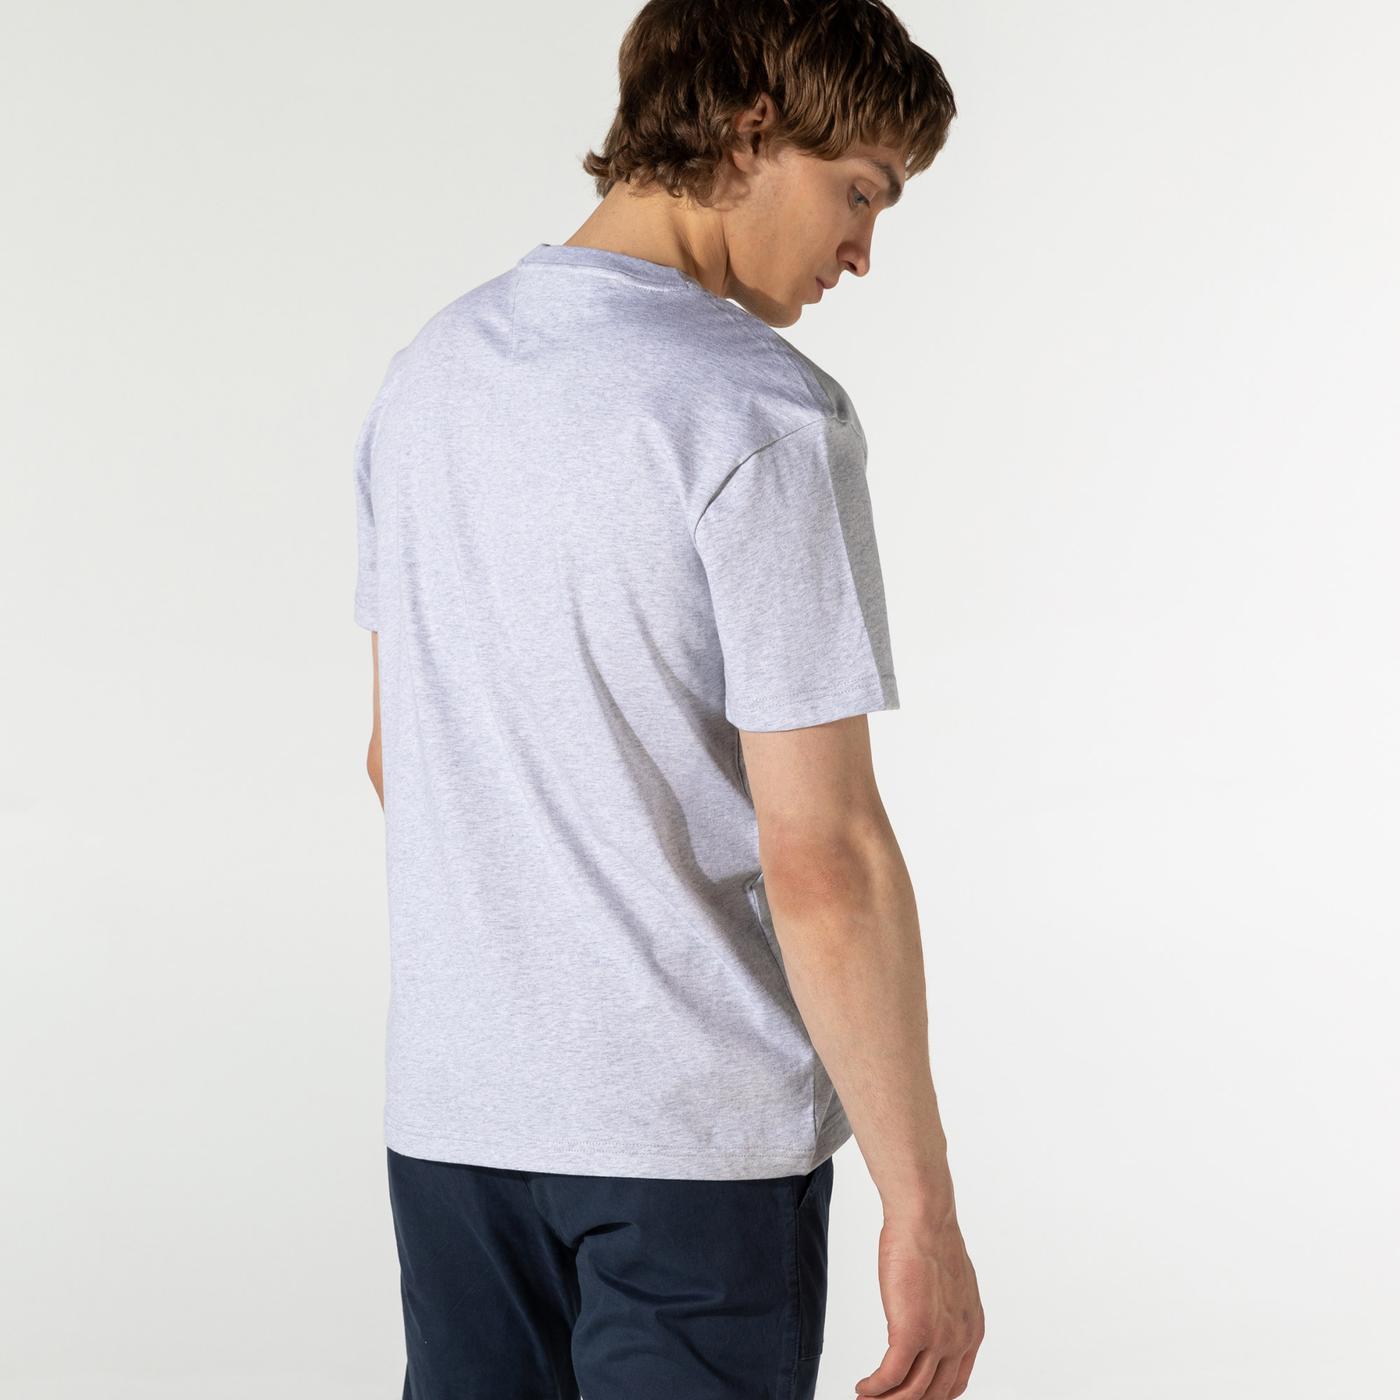 Tommy Hilfiger TJM Varsity Bball Graphic Erkek Gri T-Shirt